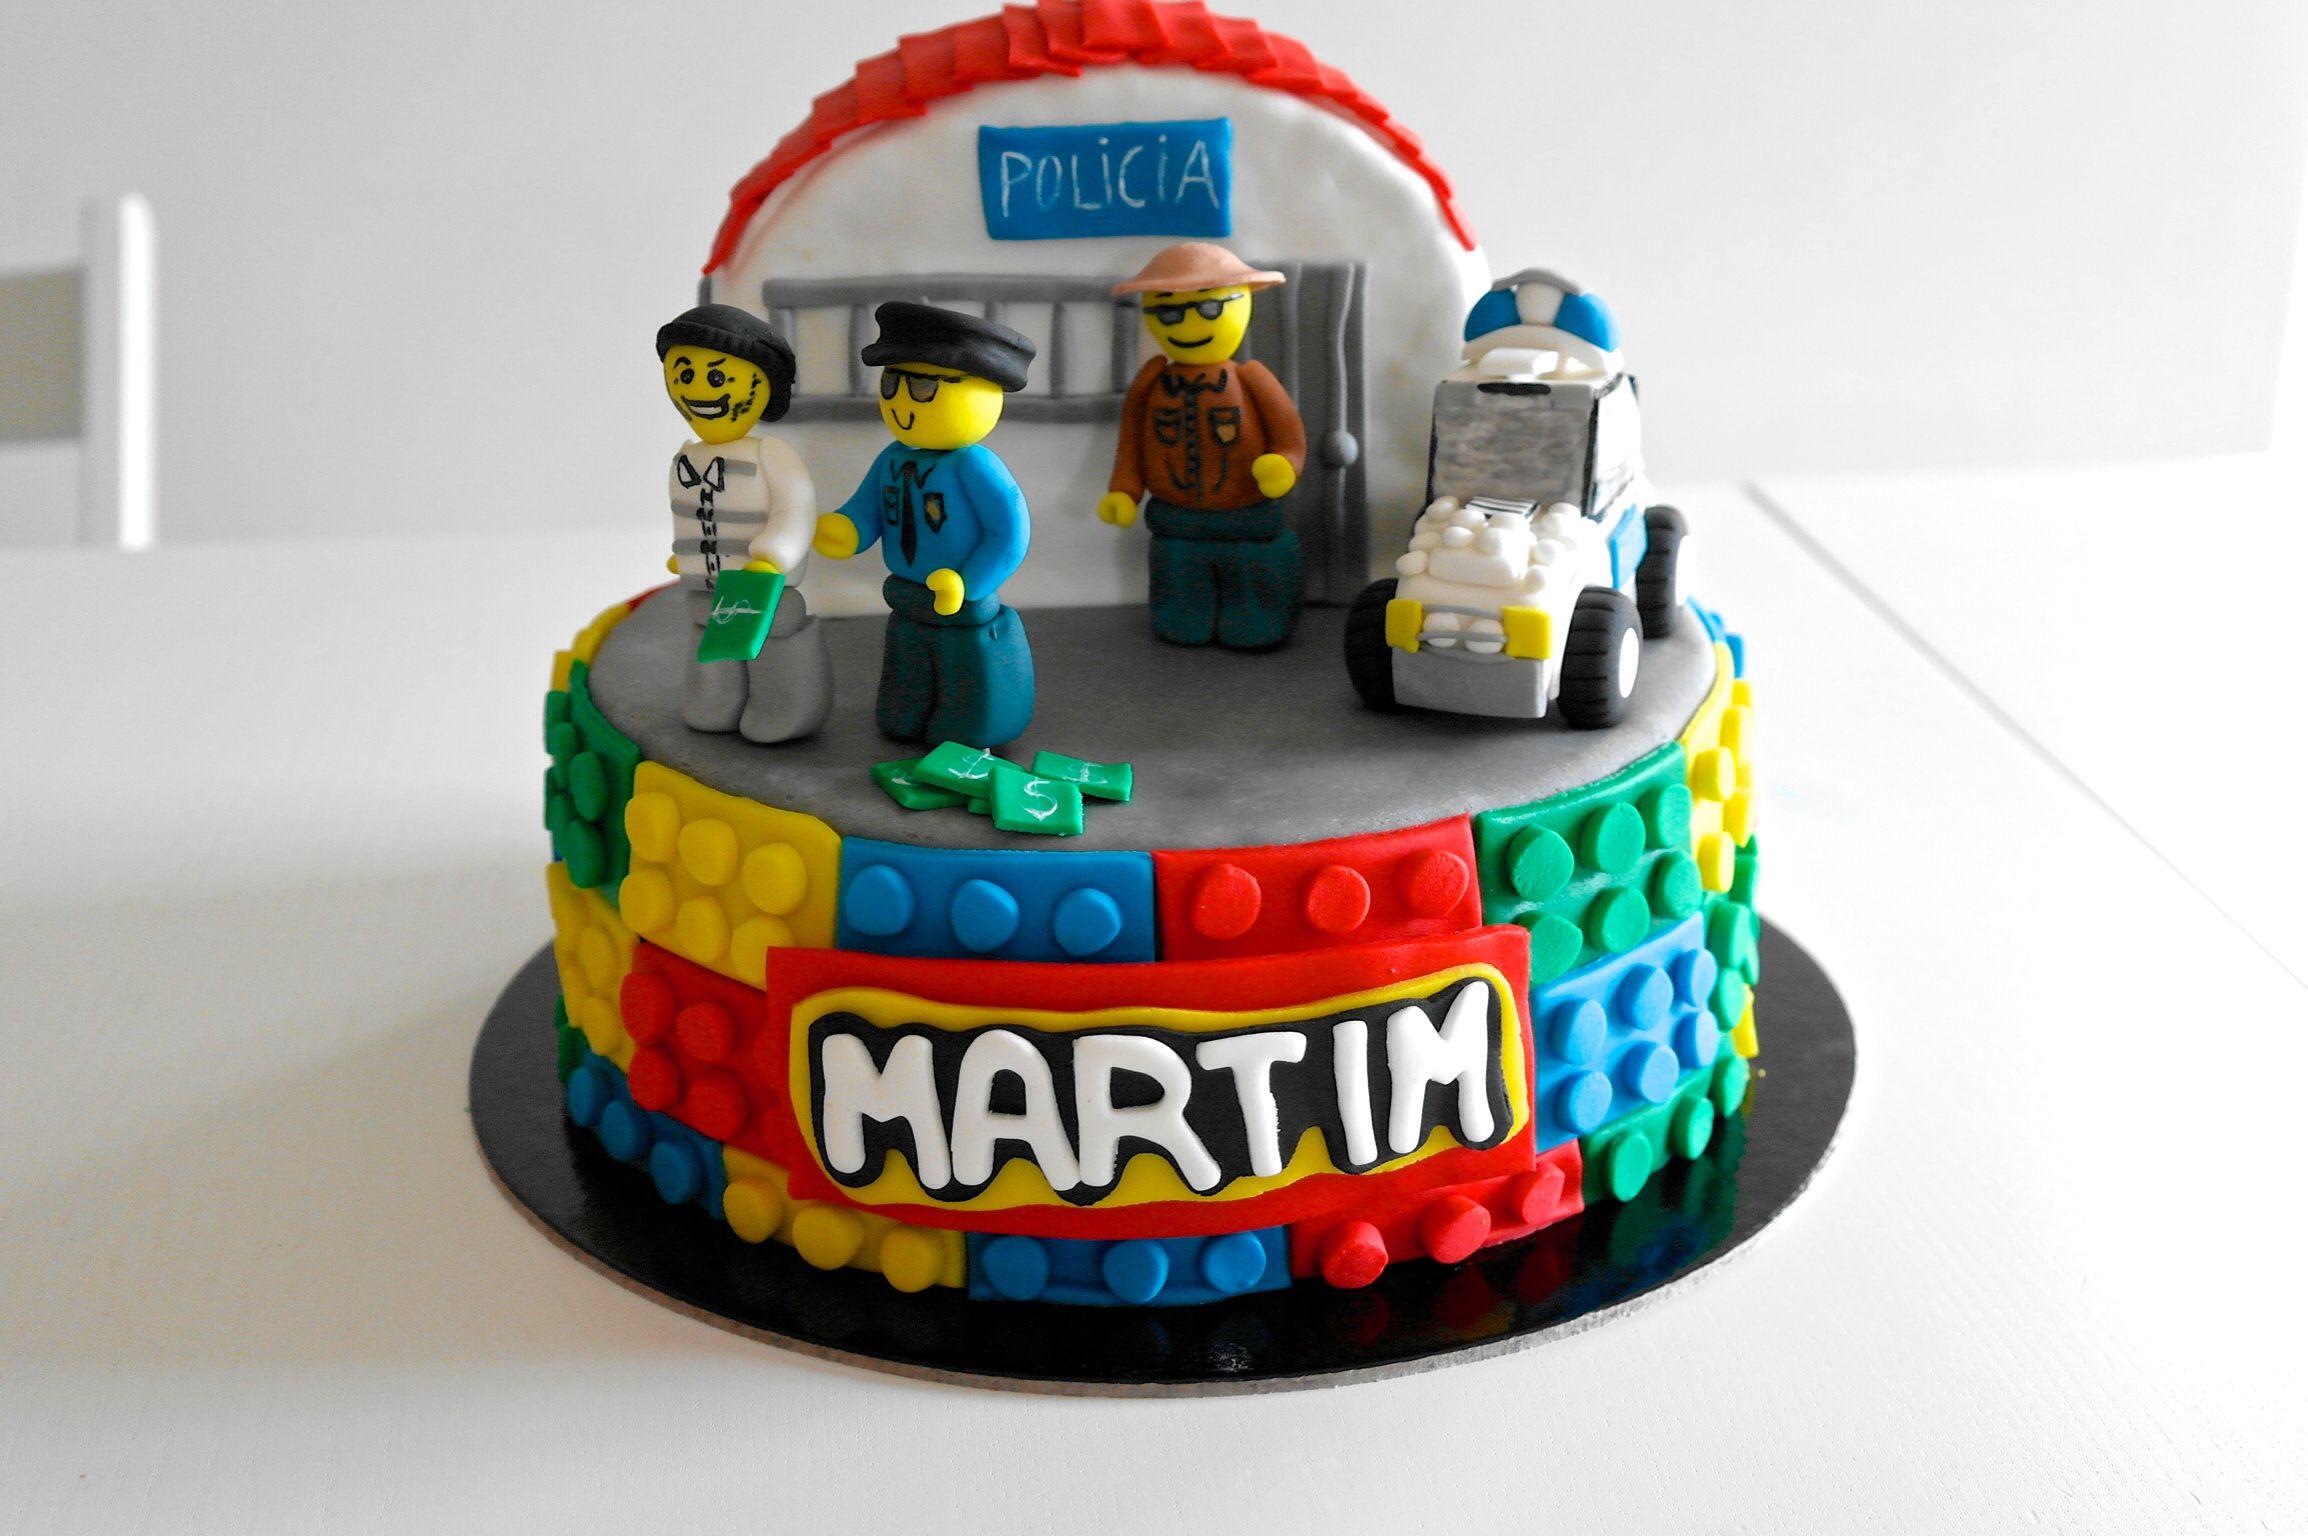 Lego Police Cake Design